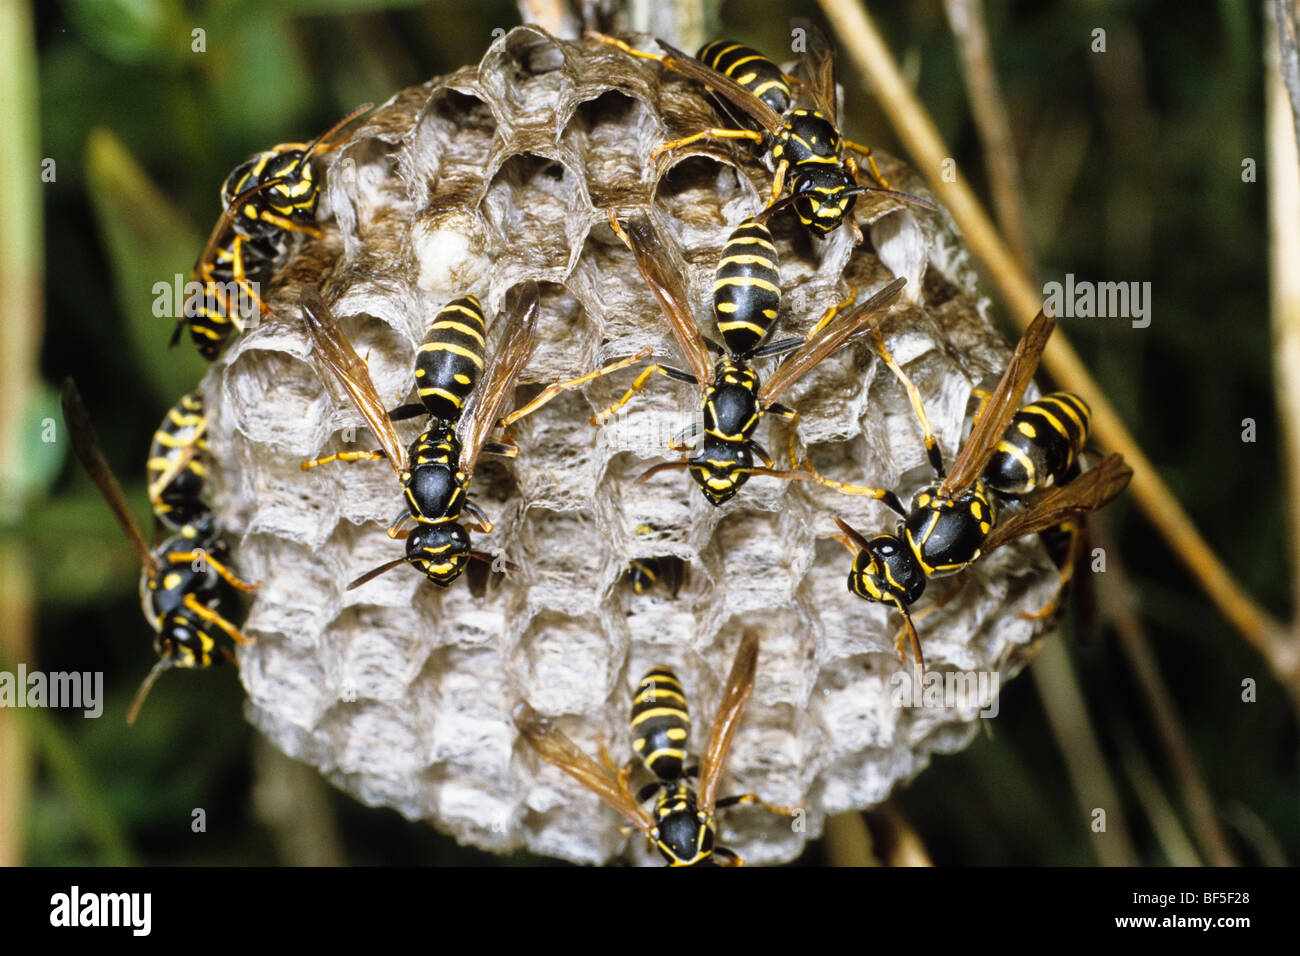 wasps stockfotos wasps bilder alamy. Black Bedroom Furniture Sets. Home Design Ideas